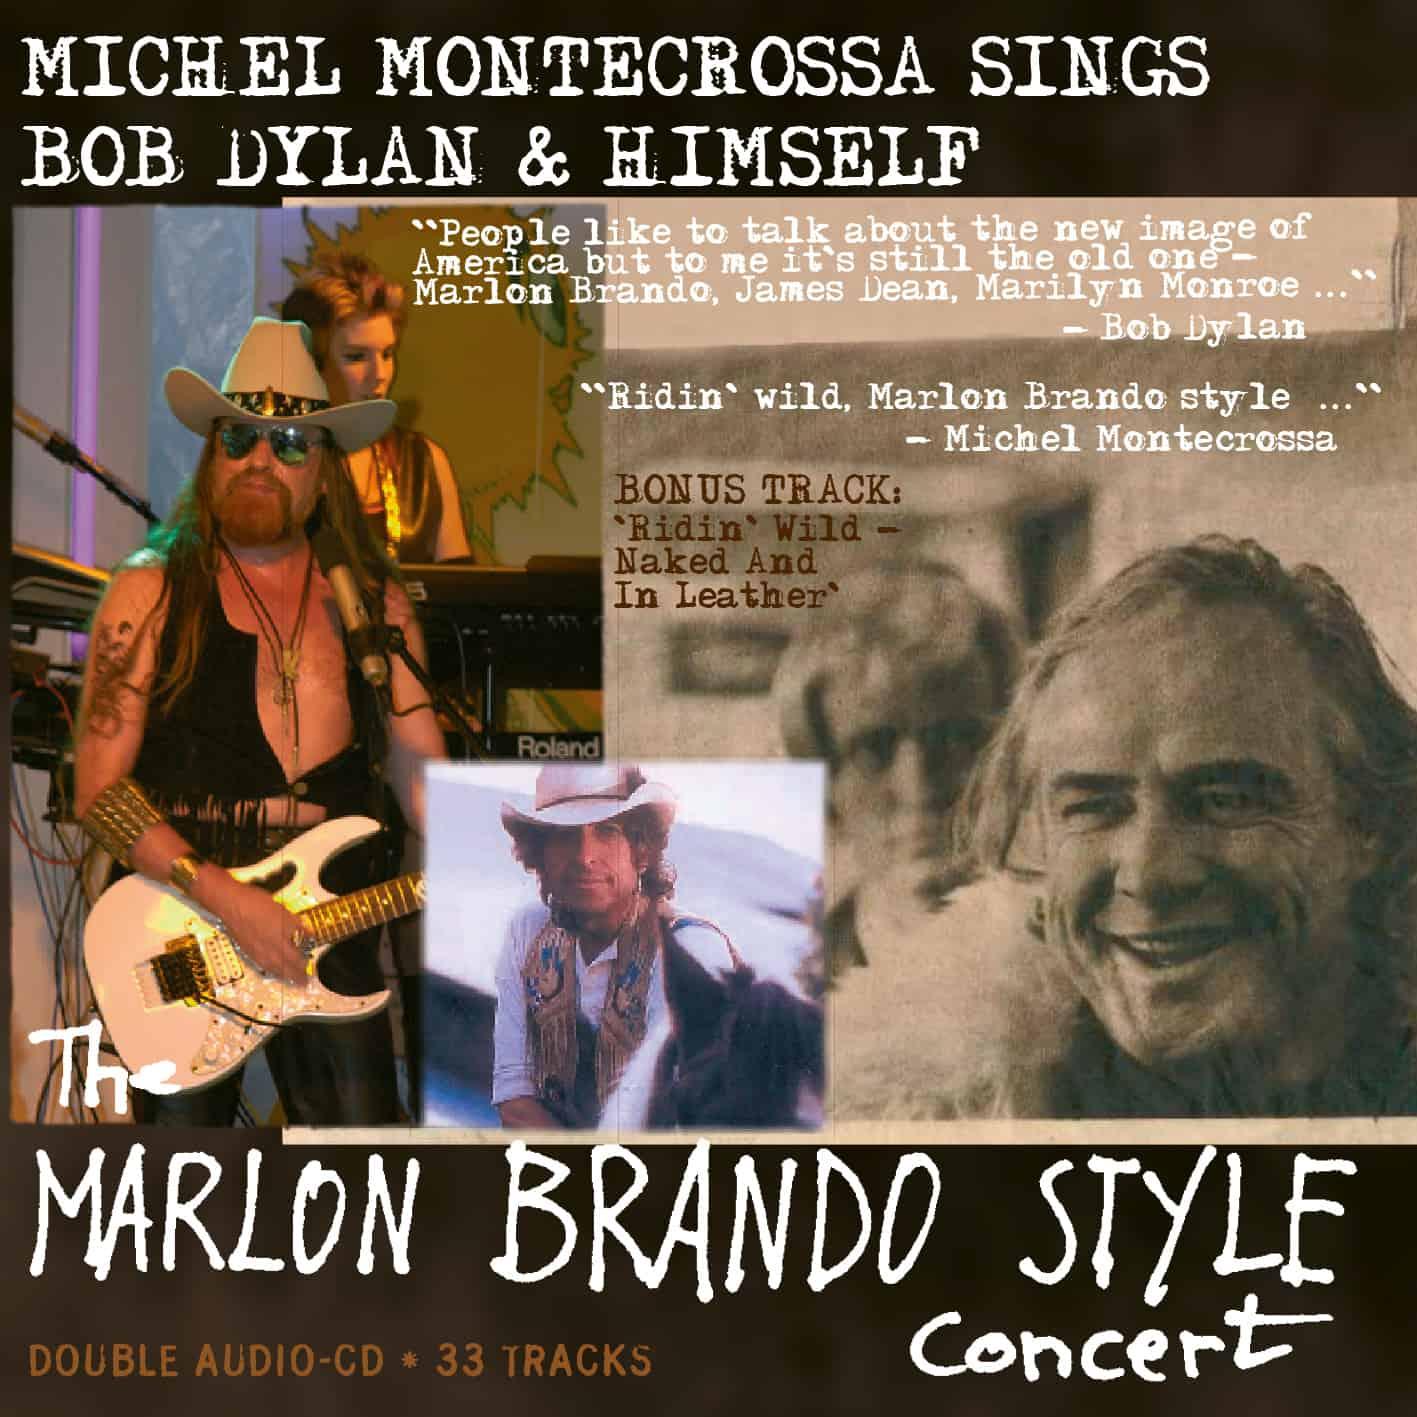 The Marlon Brando Style Concert